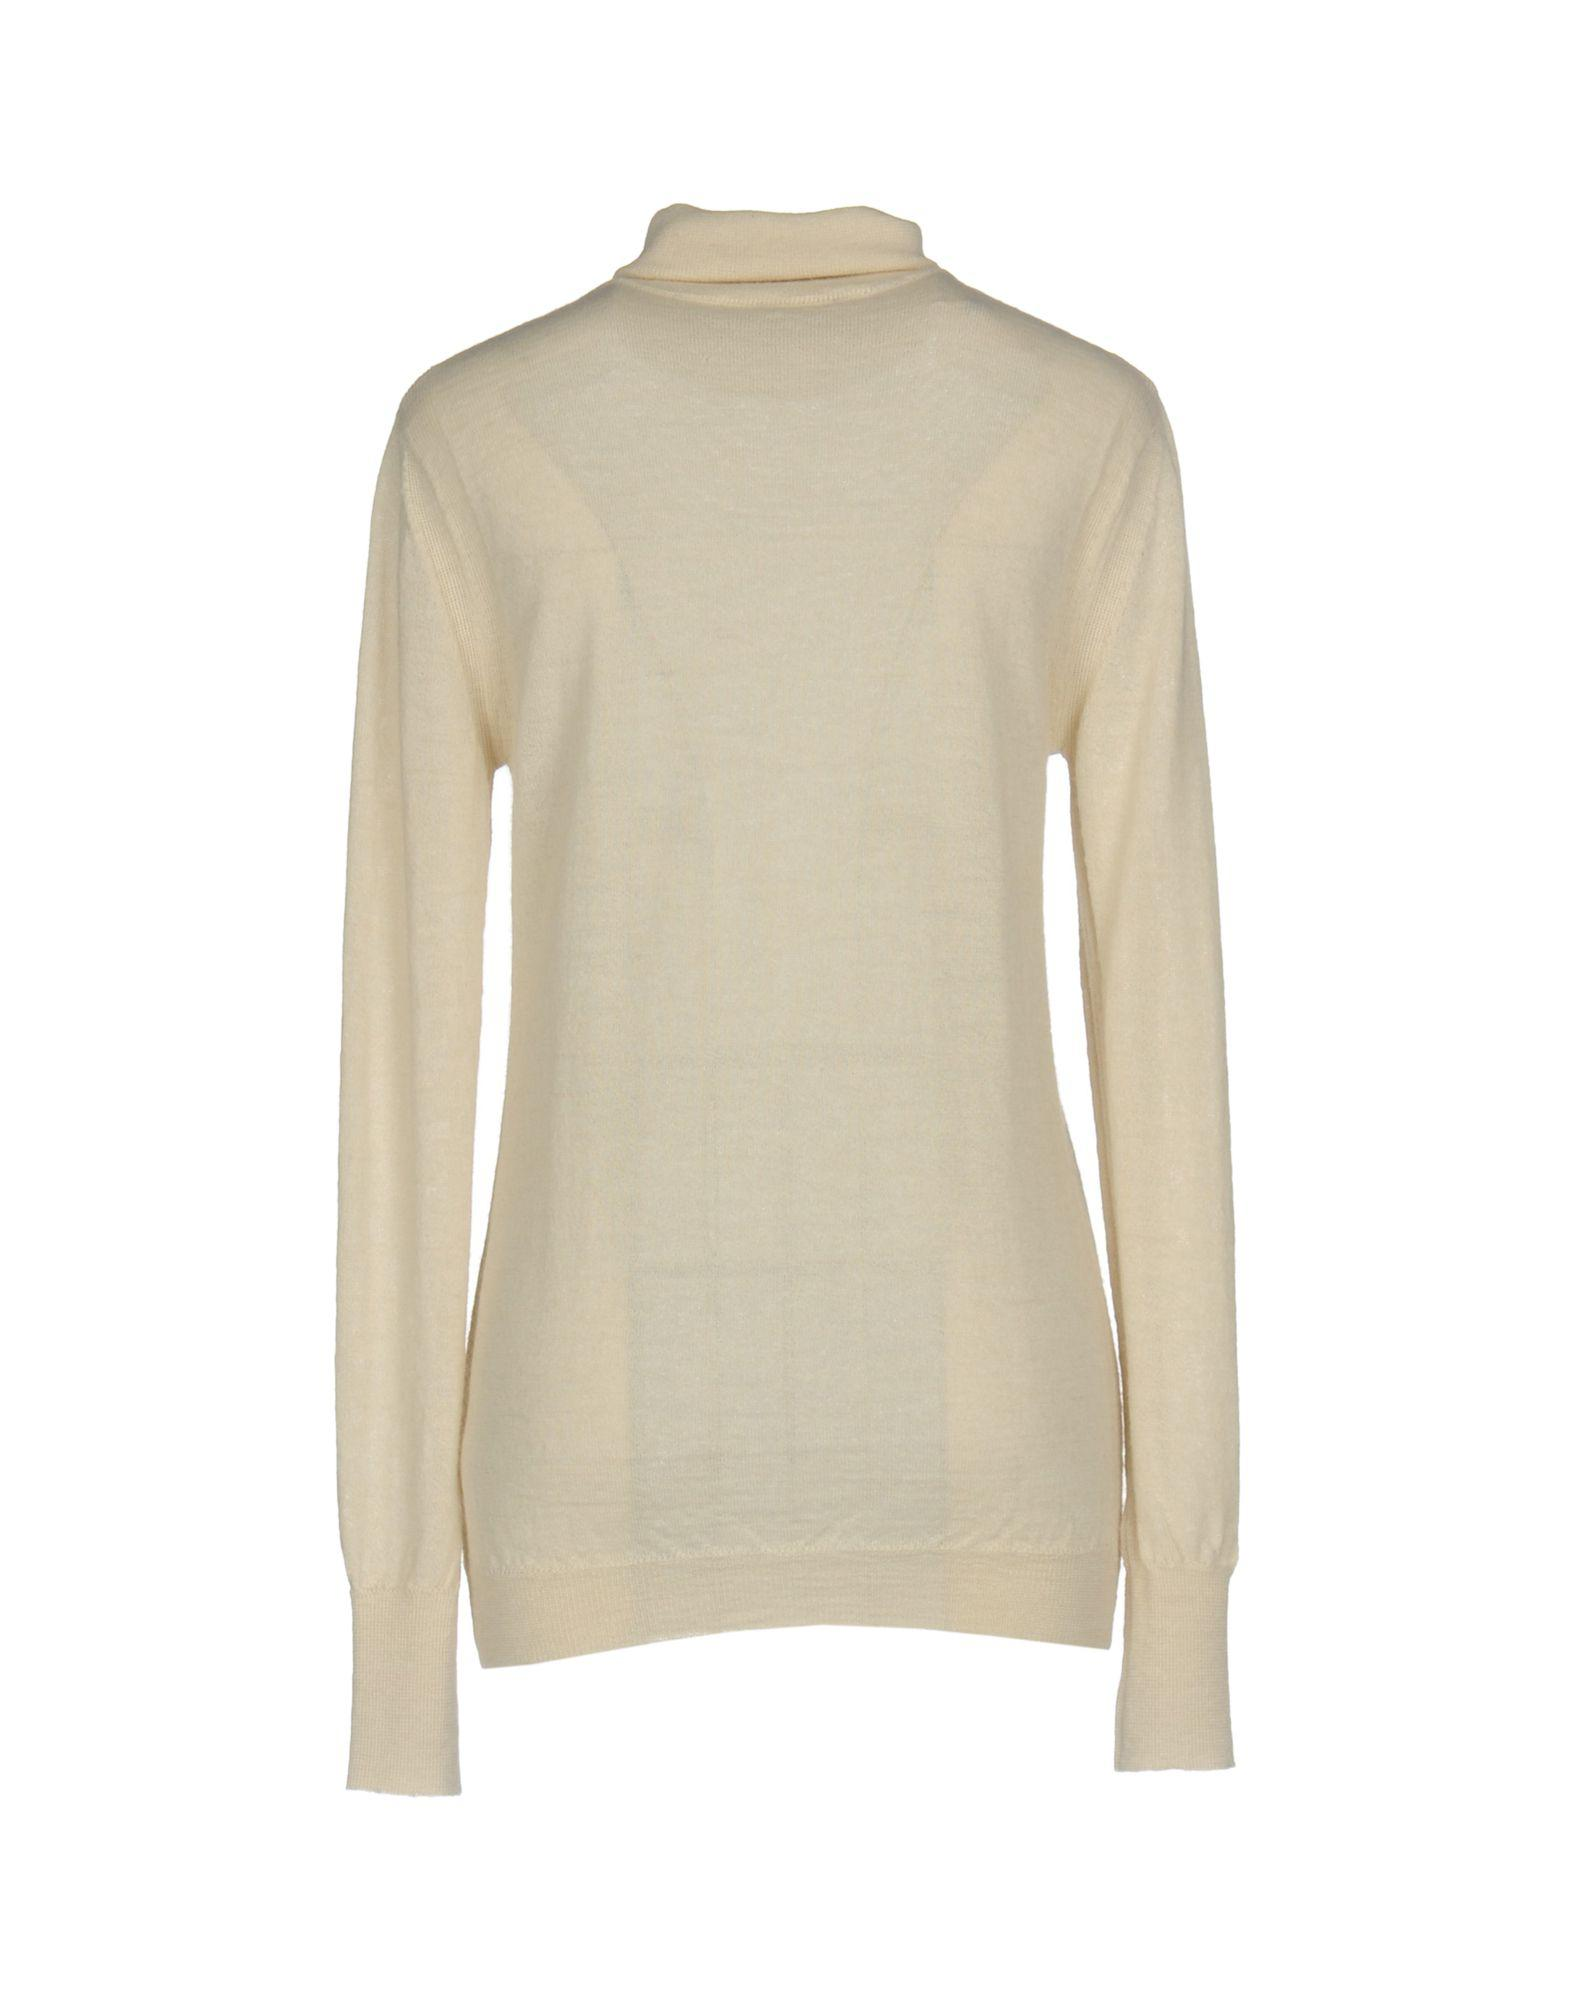 M.i.h Jeans Wool Turtlenecks in Ivory (White)